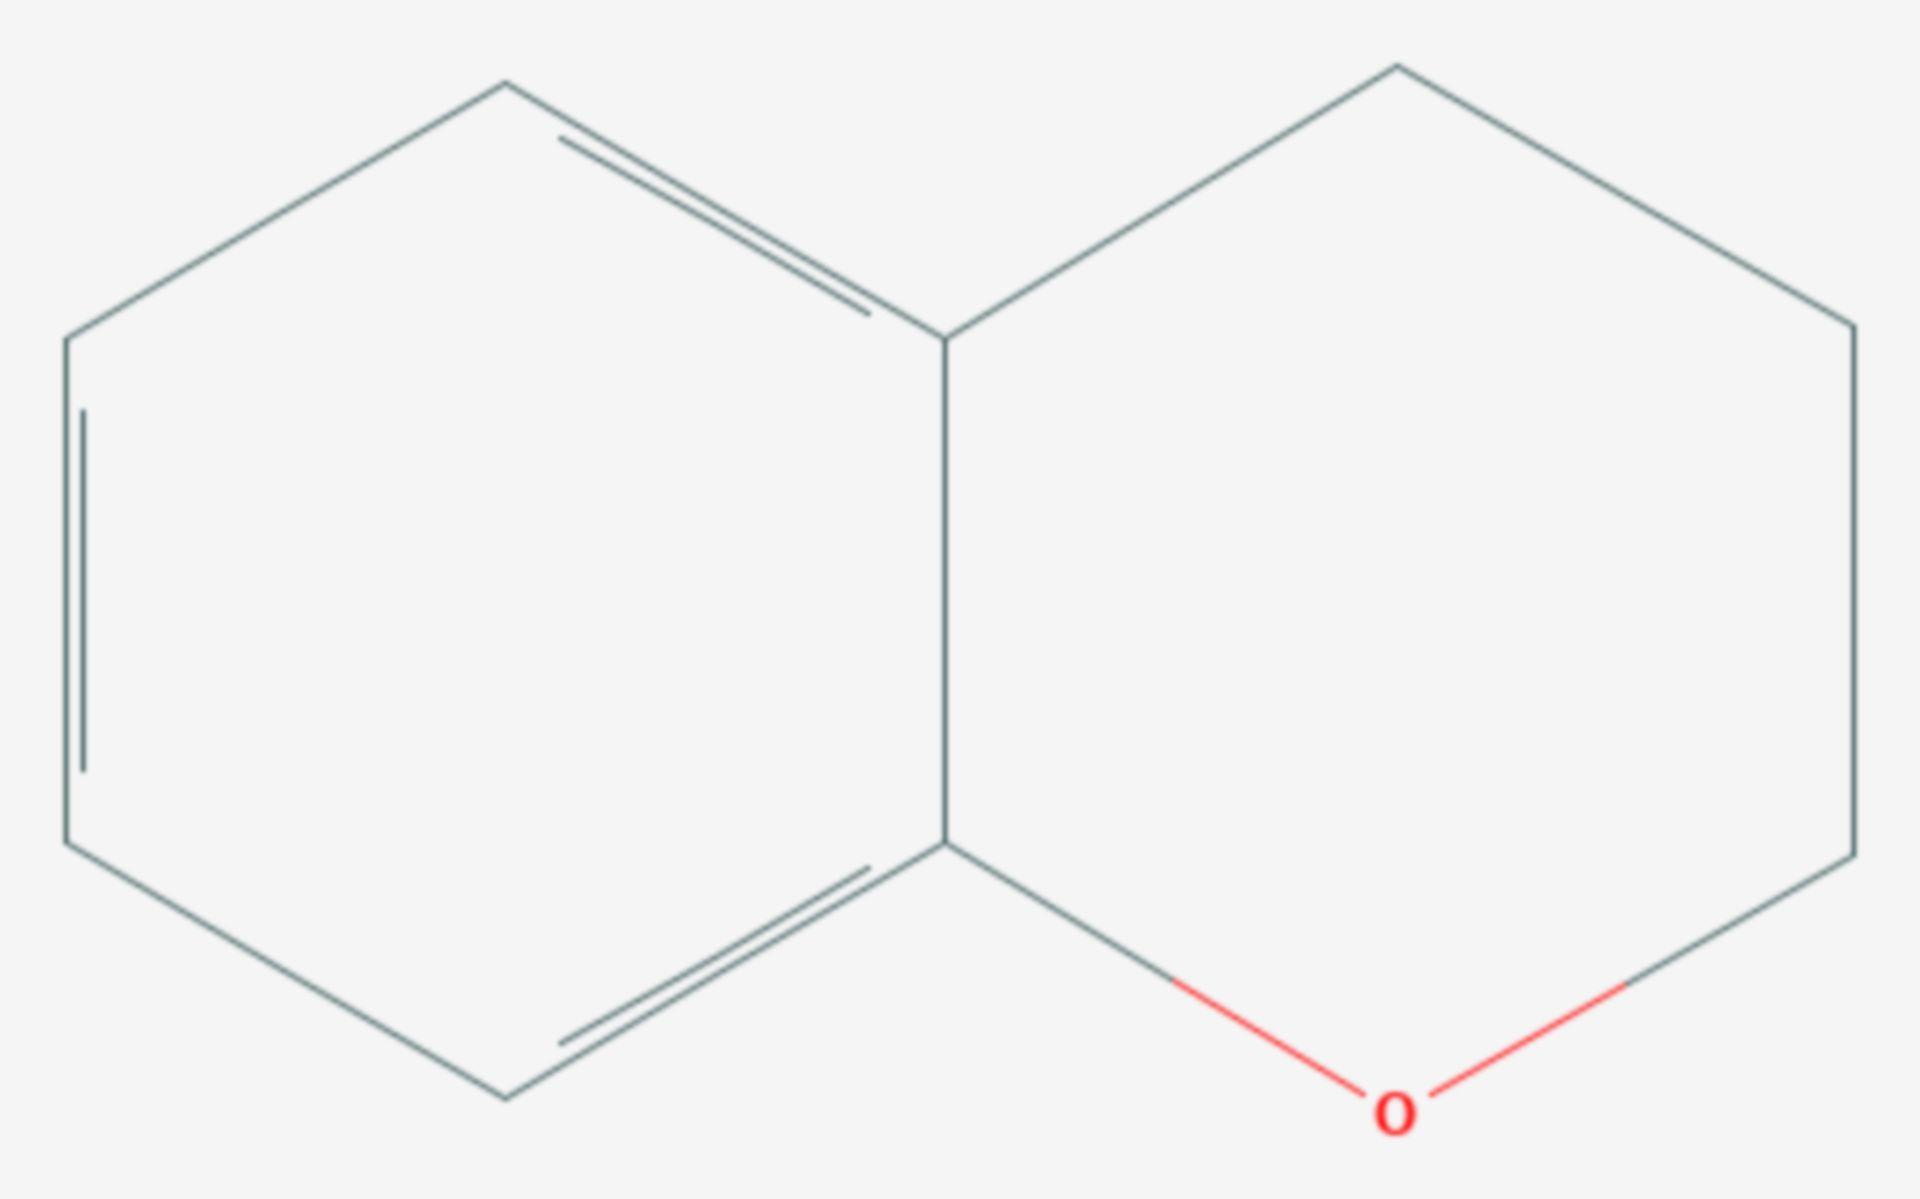 Chroman (Strukturformel)